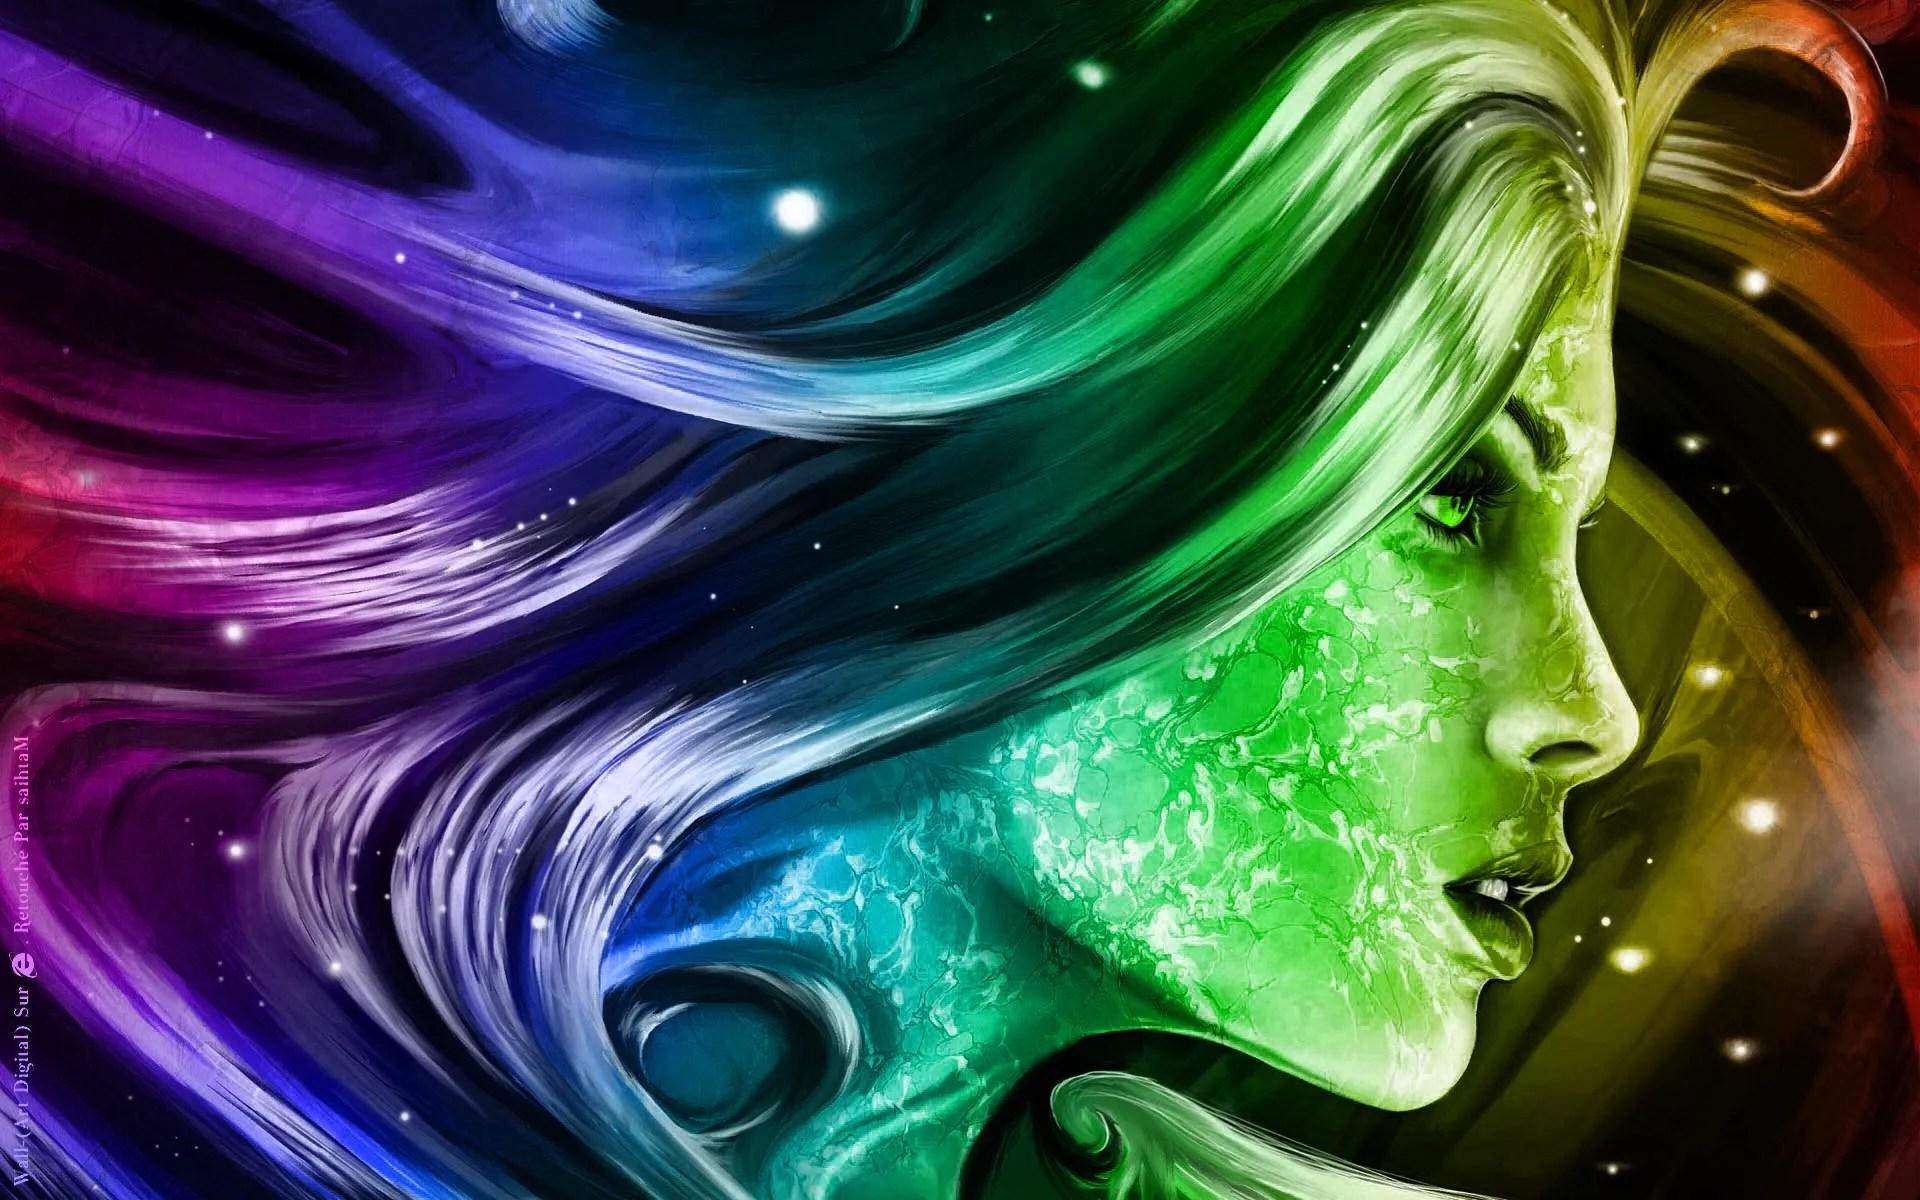 digital art wallpapers | best wallpapers